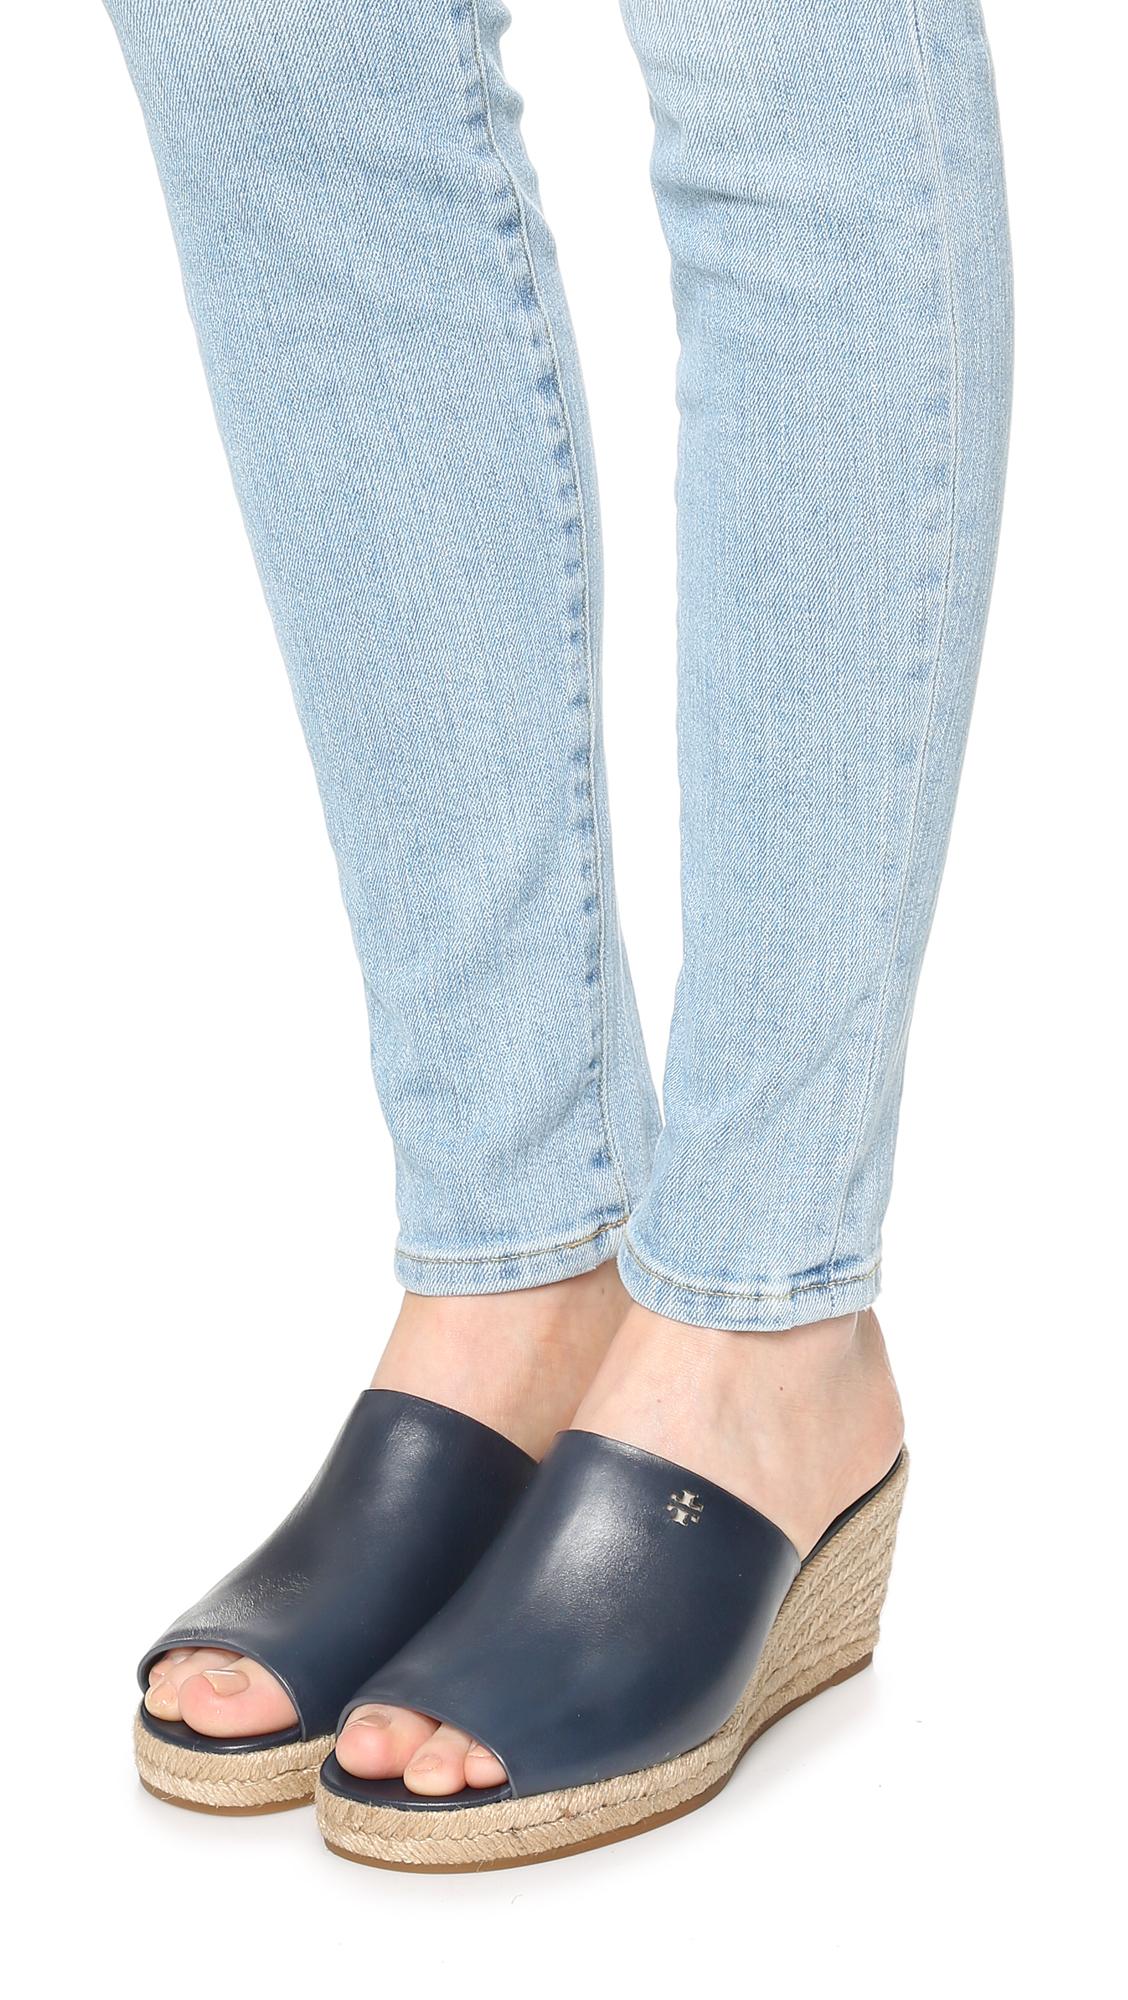 7bd1e99ea49a3 Tory Burch Bima Wedge Espadrille Sandals